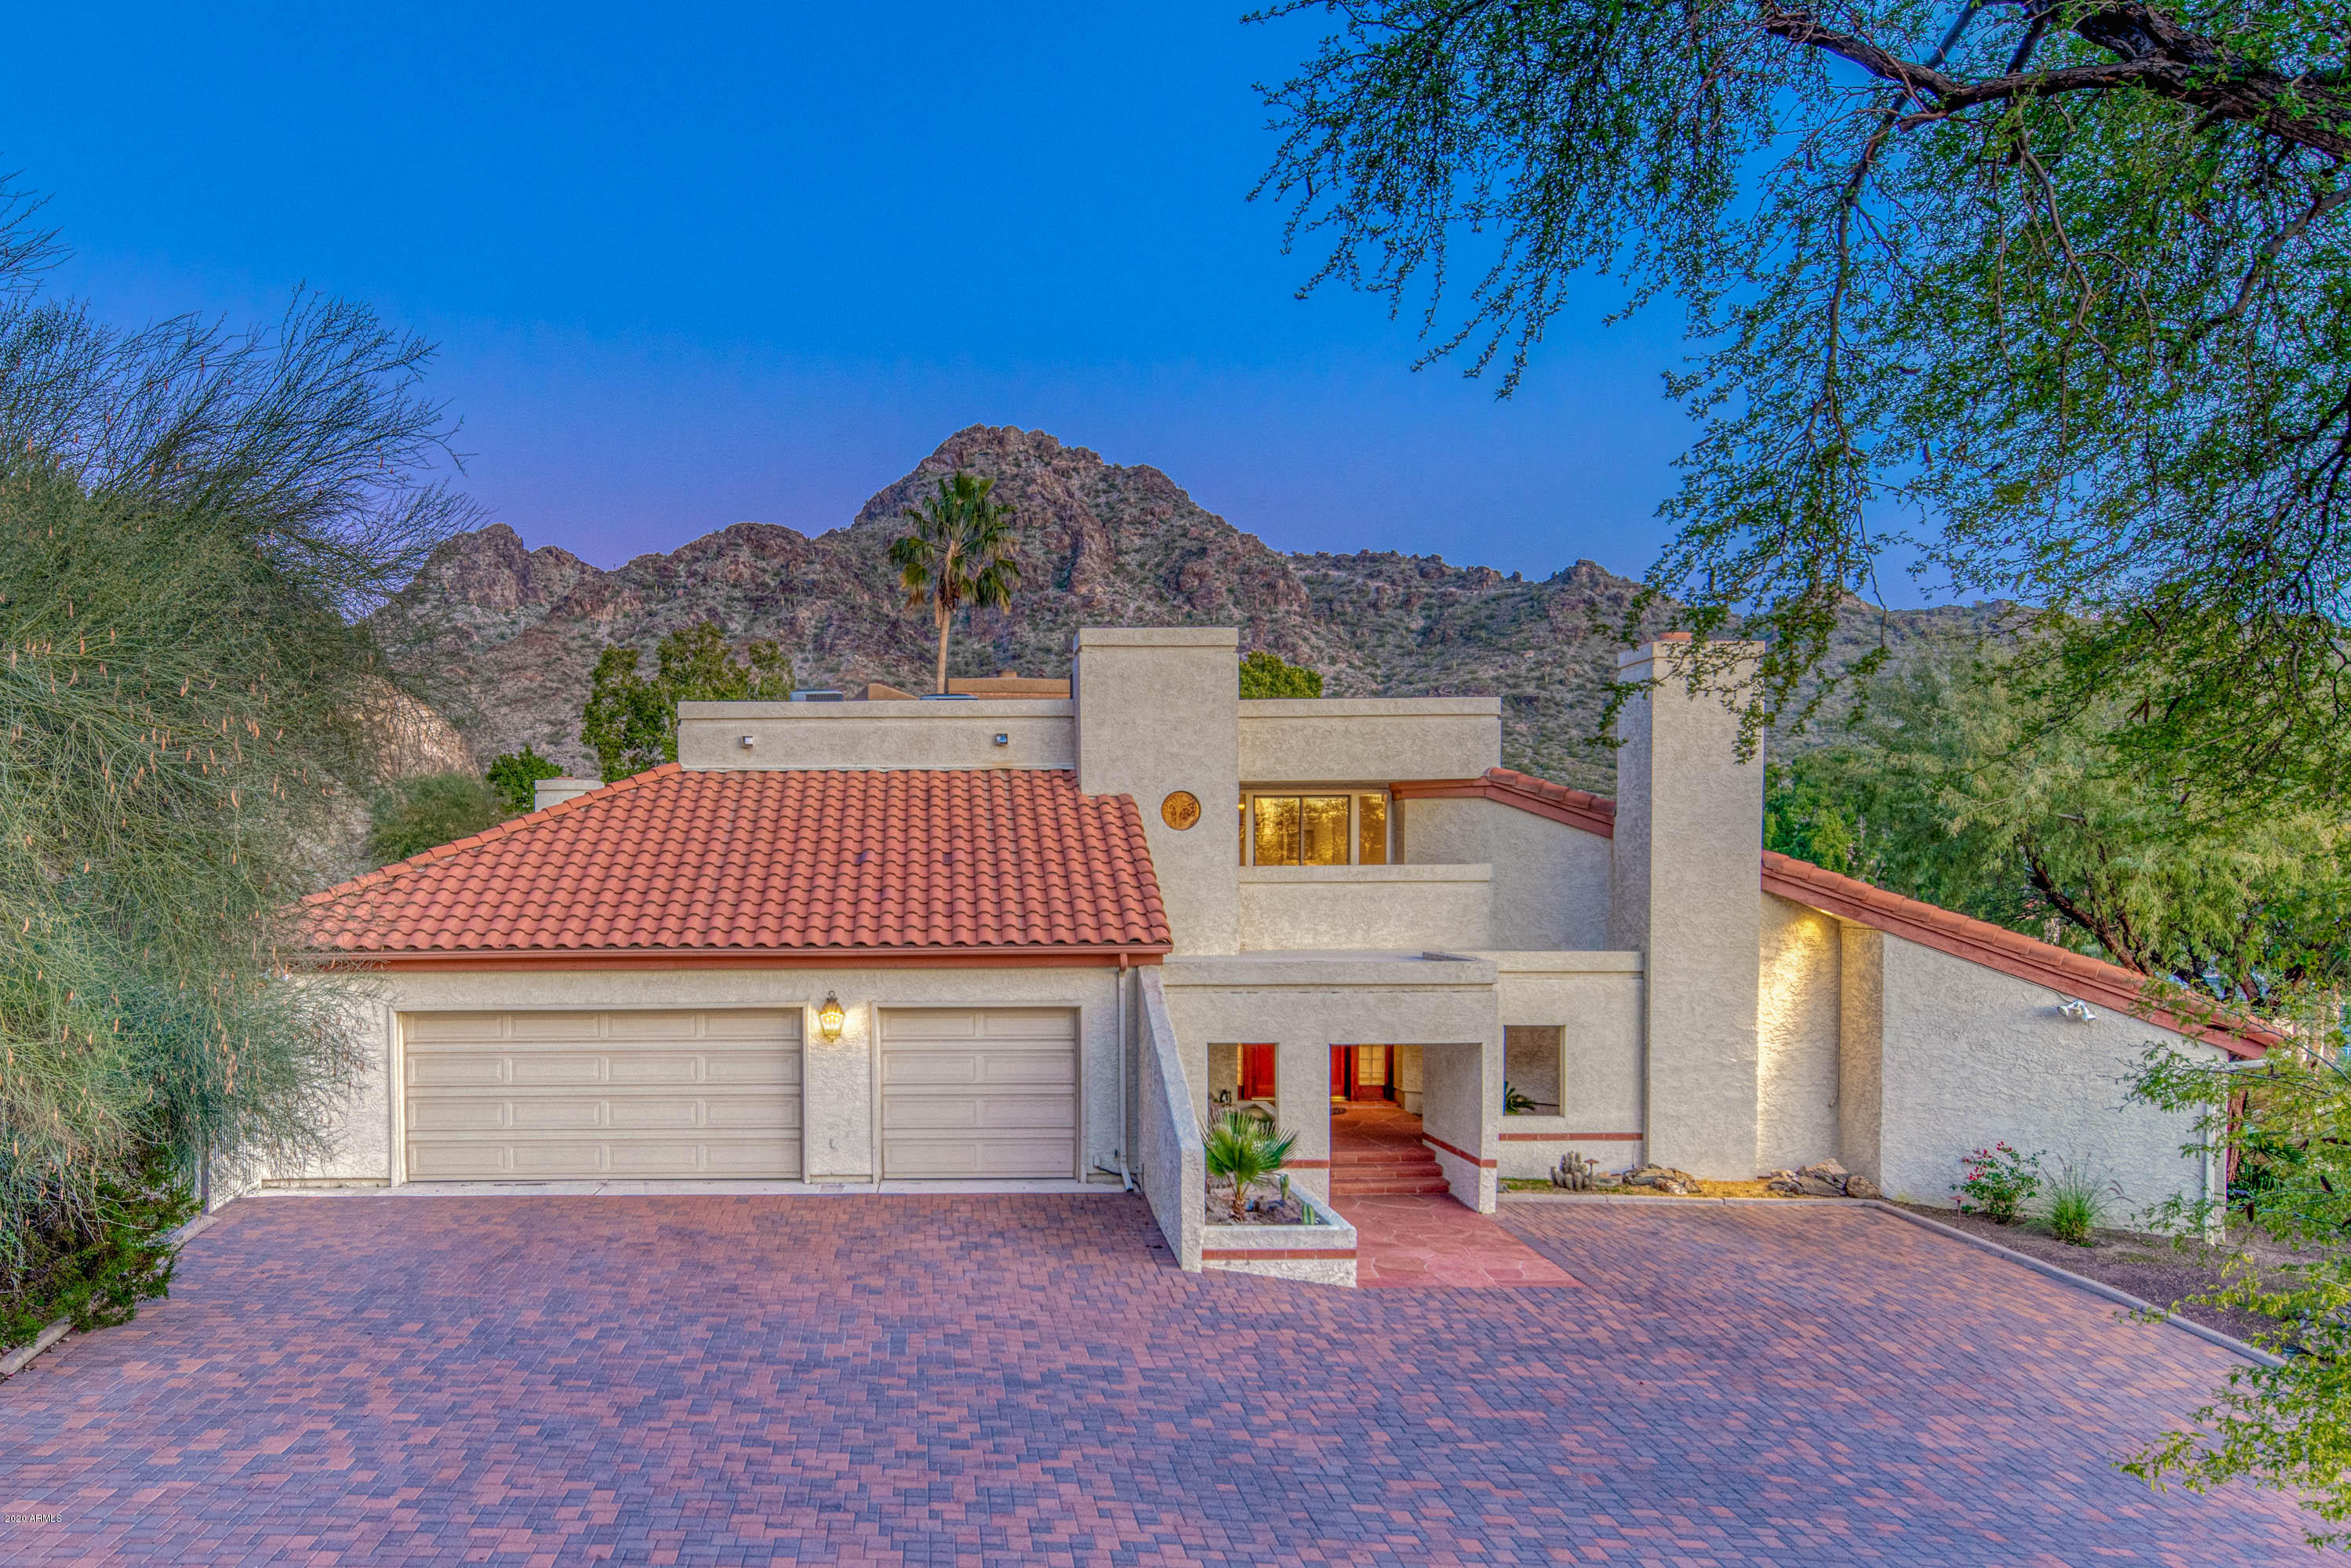 Photo of 7539 N 21ST Place, Phoenix, AZ 85020